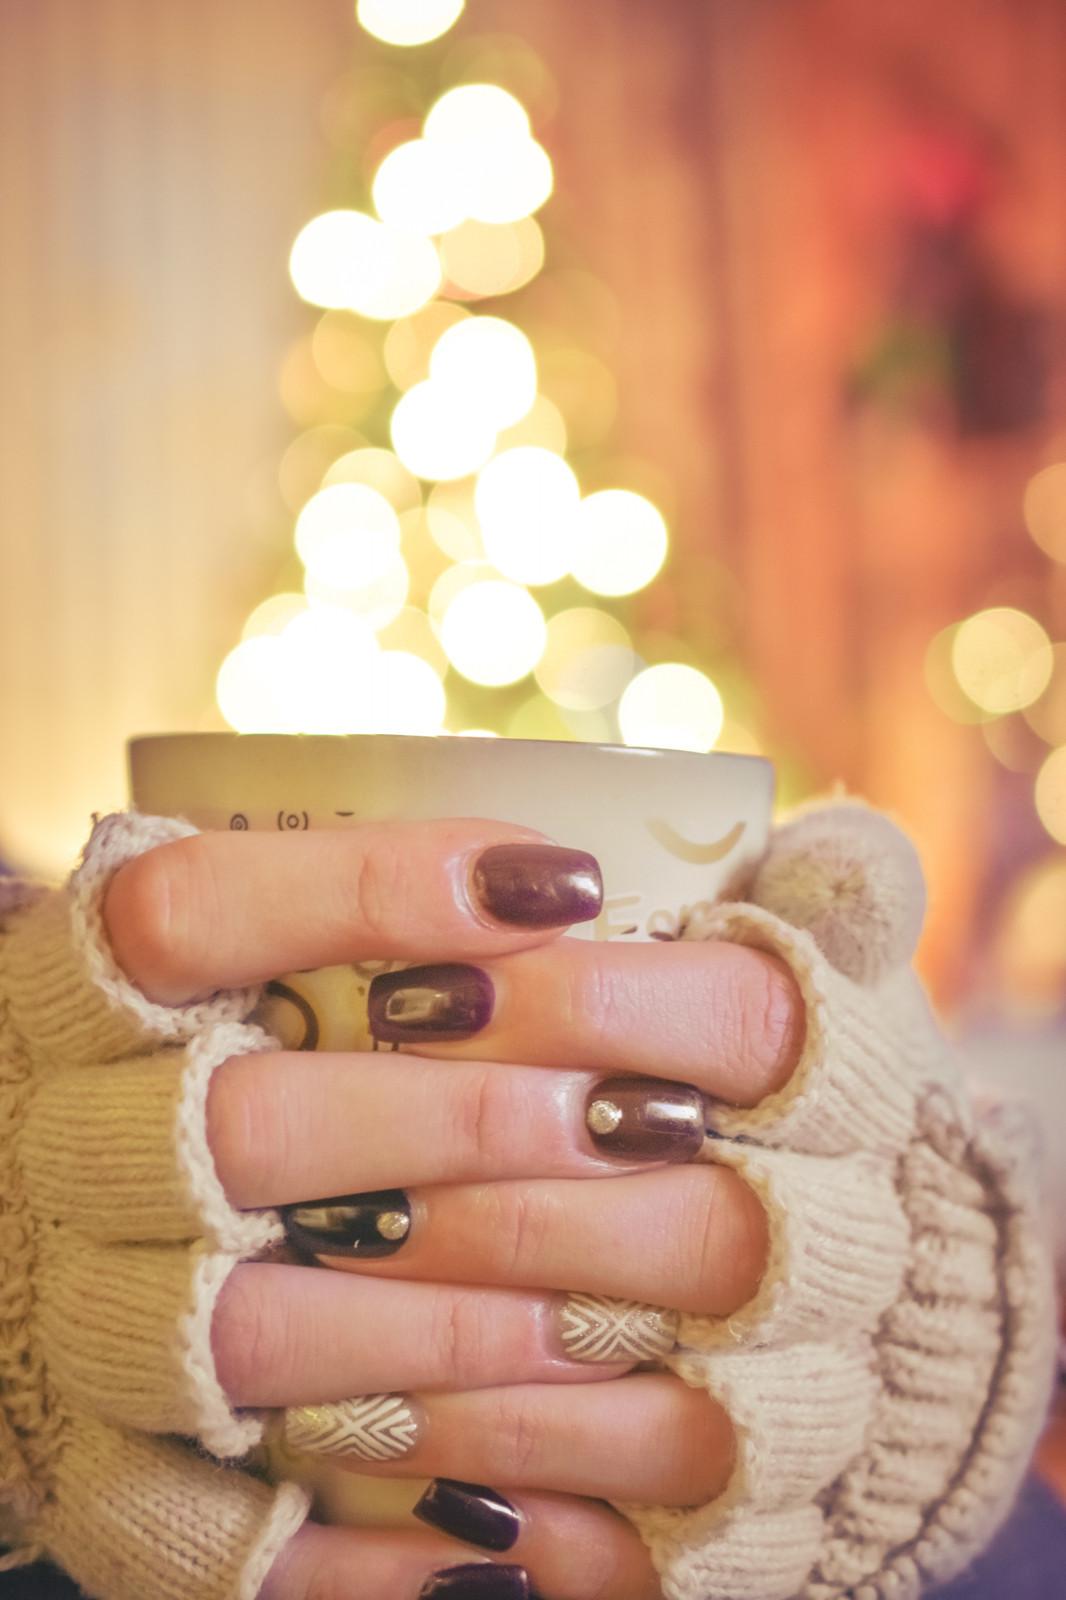 NiNi Nails | Manicure Pedicure | Tampa